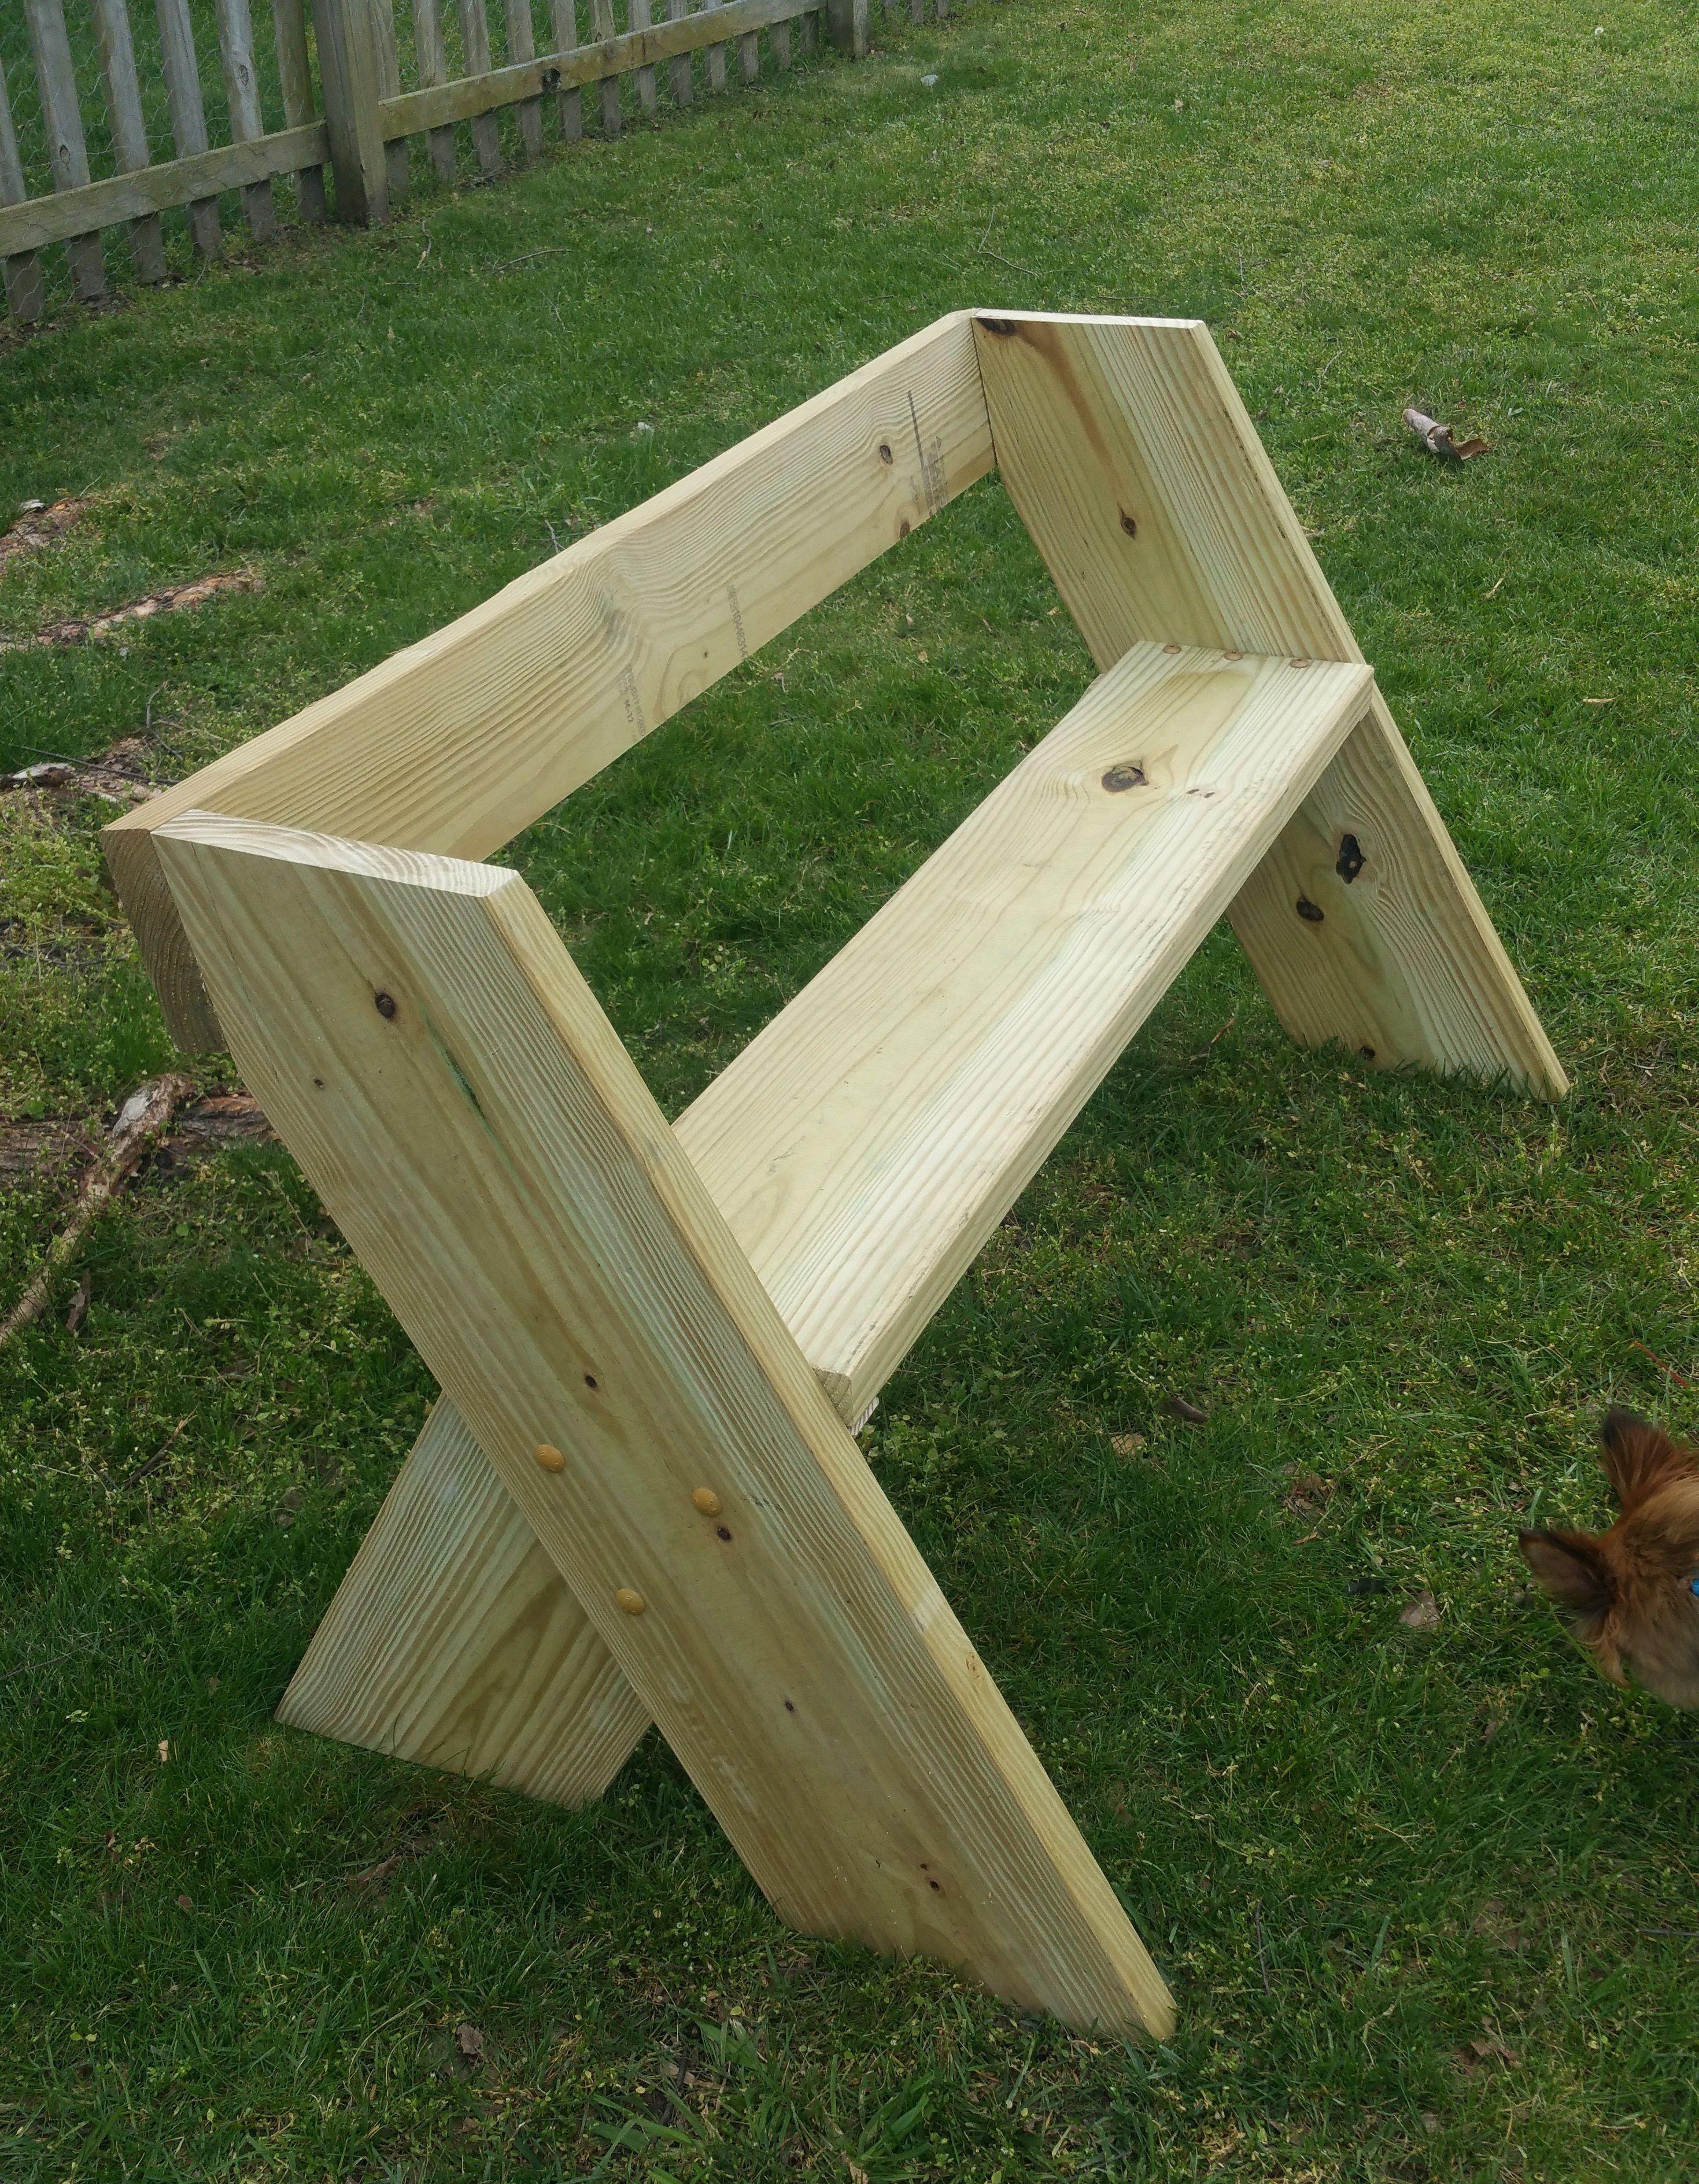 Ryobi Nation Aldo Leopold Bench Diy Bench Outdoor Garden Bench Plans Wood Bench Plans